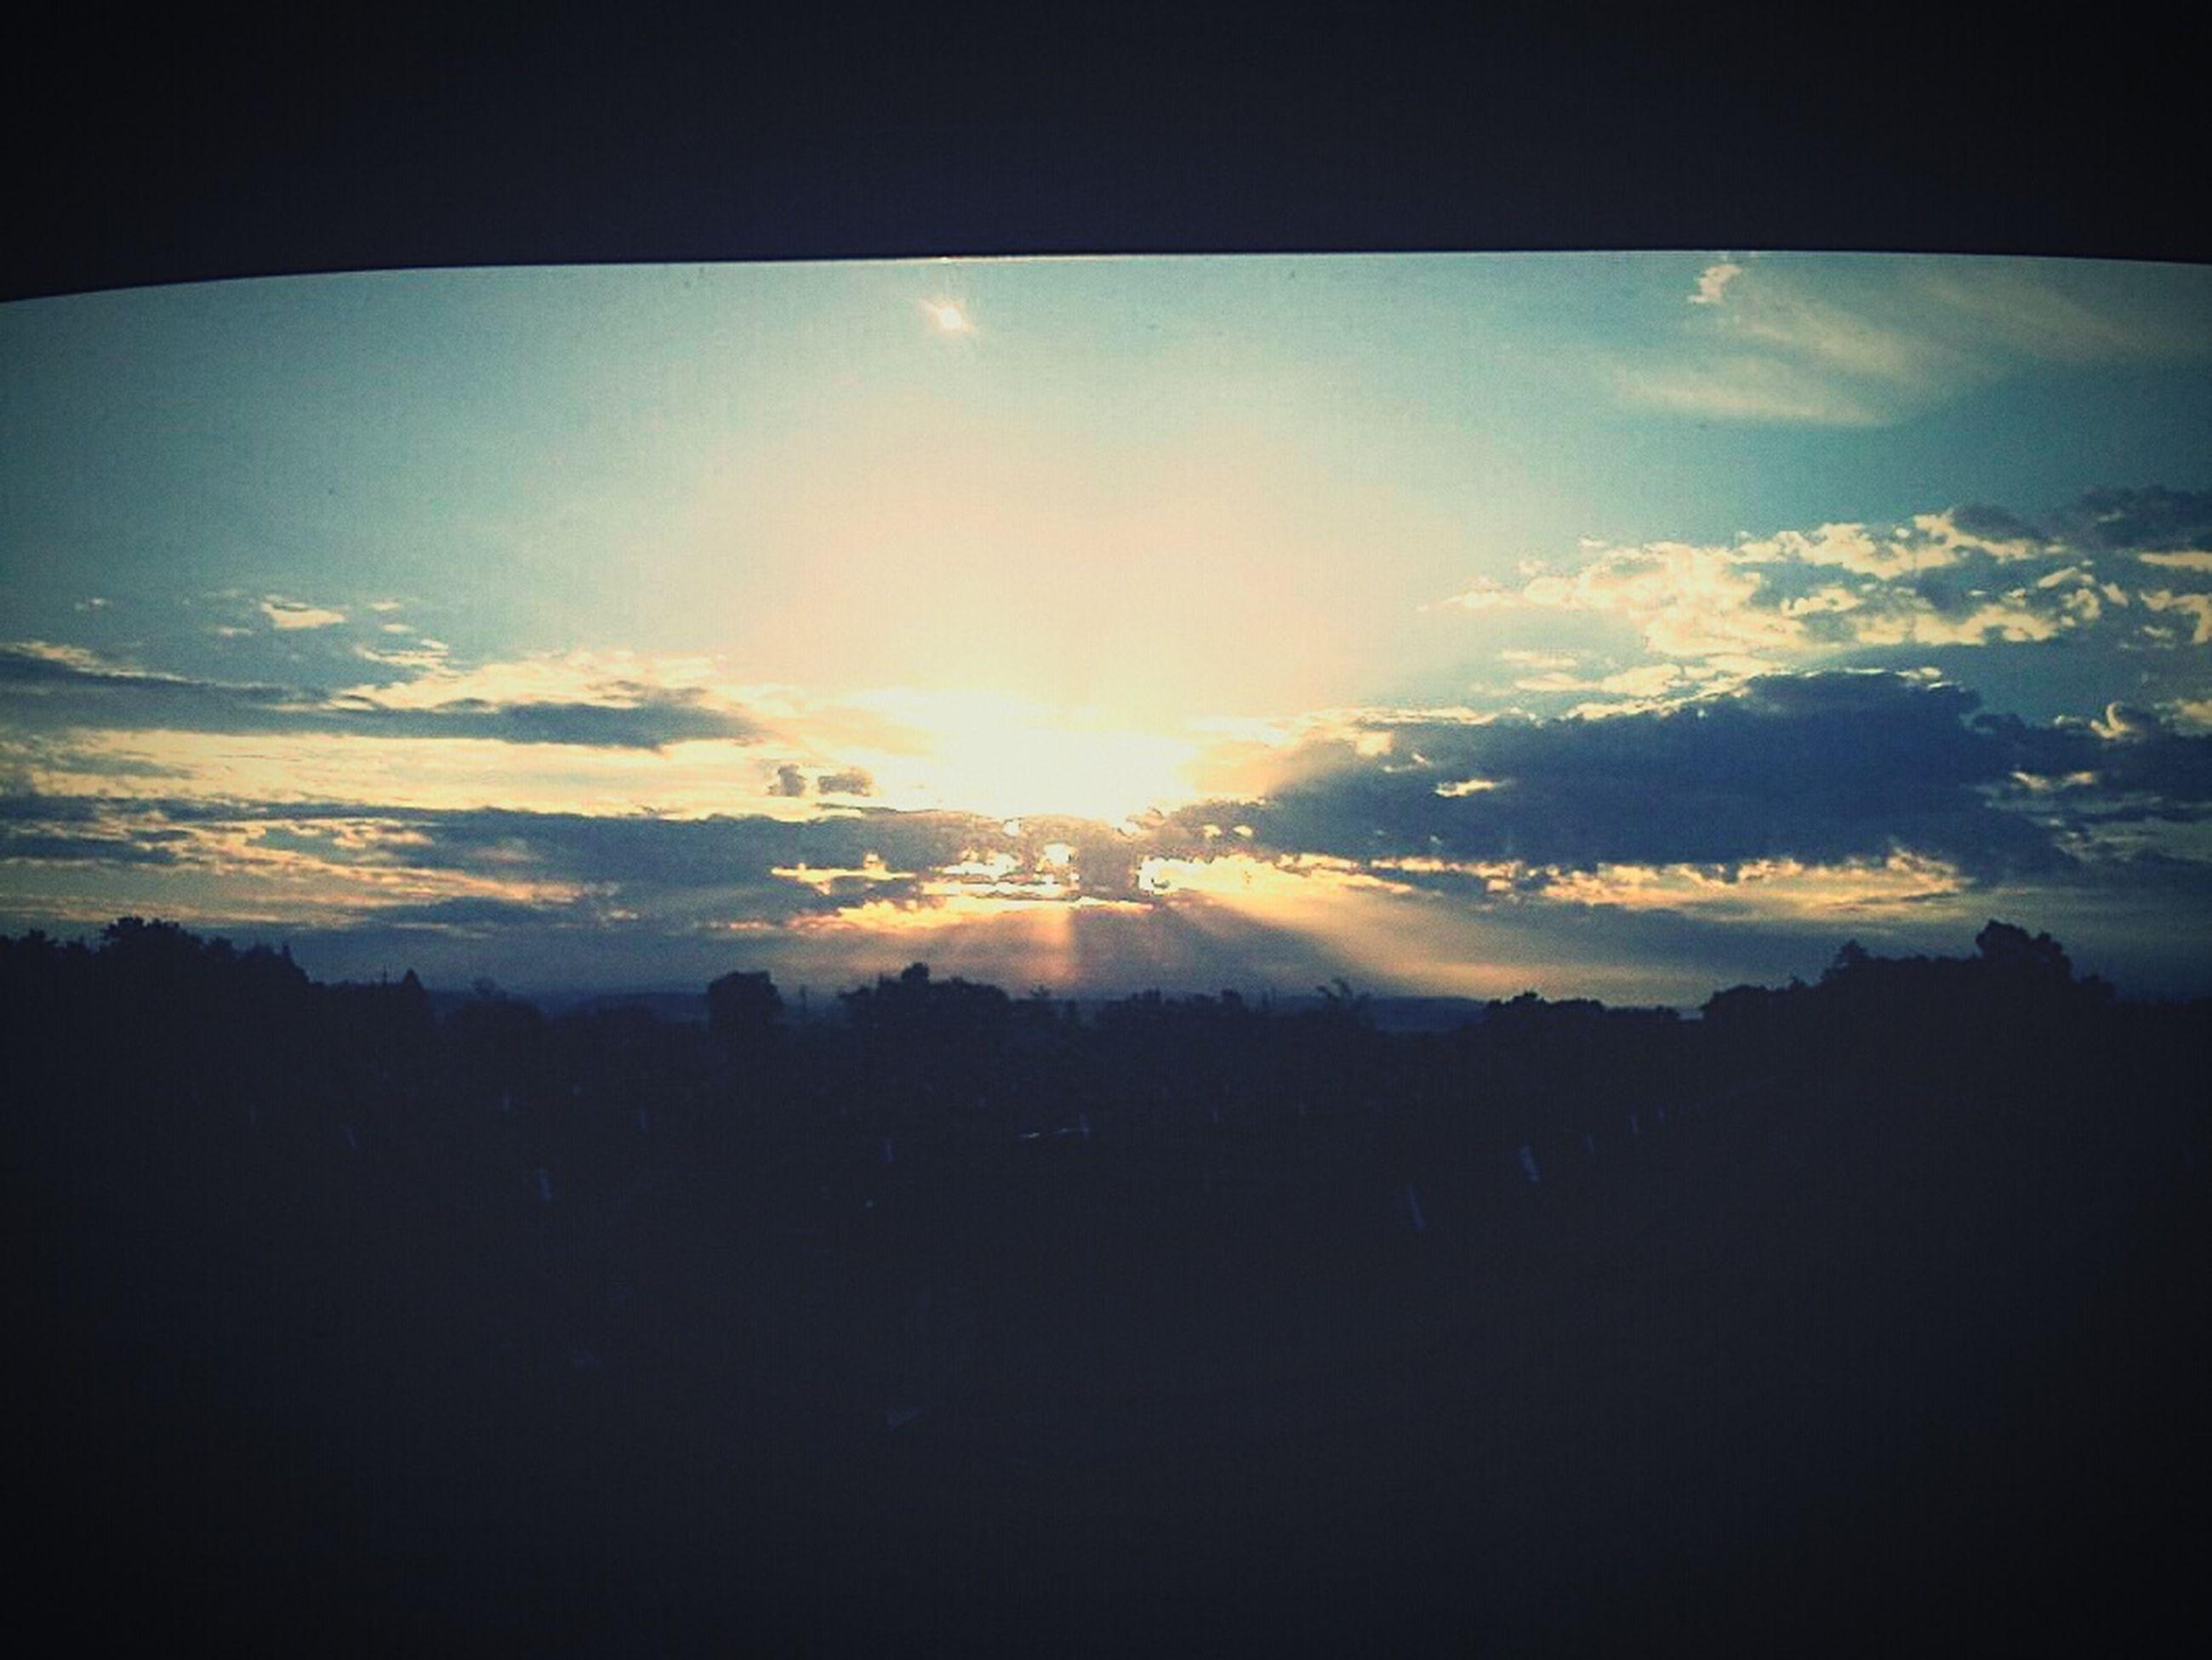 silhouette, scenics, sky, tranquil scene, beauty in nature, tranquility, sun, landscape, mountain, sunset, nature, cloud - sky, sunlight, sunbeam, cloud, idyllic, mountain range, dark, no people, majestic